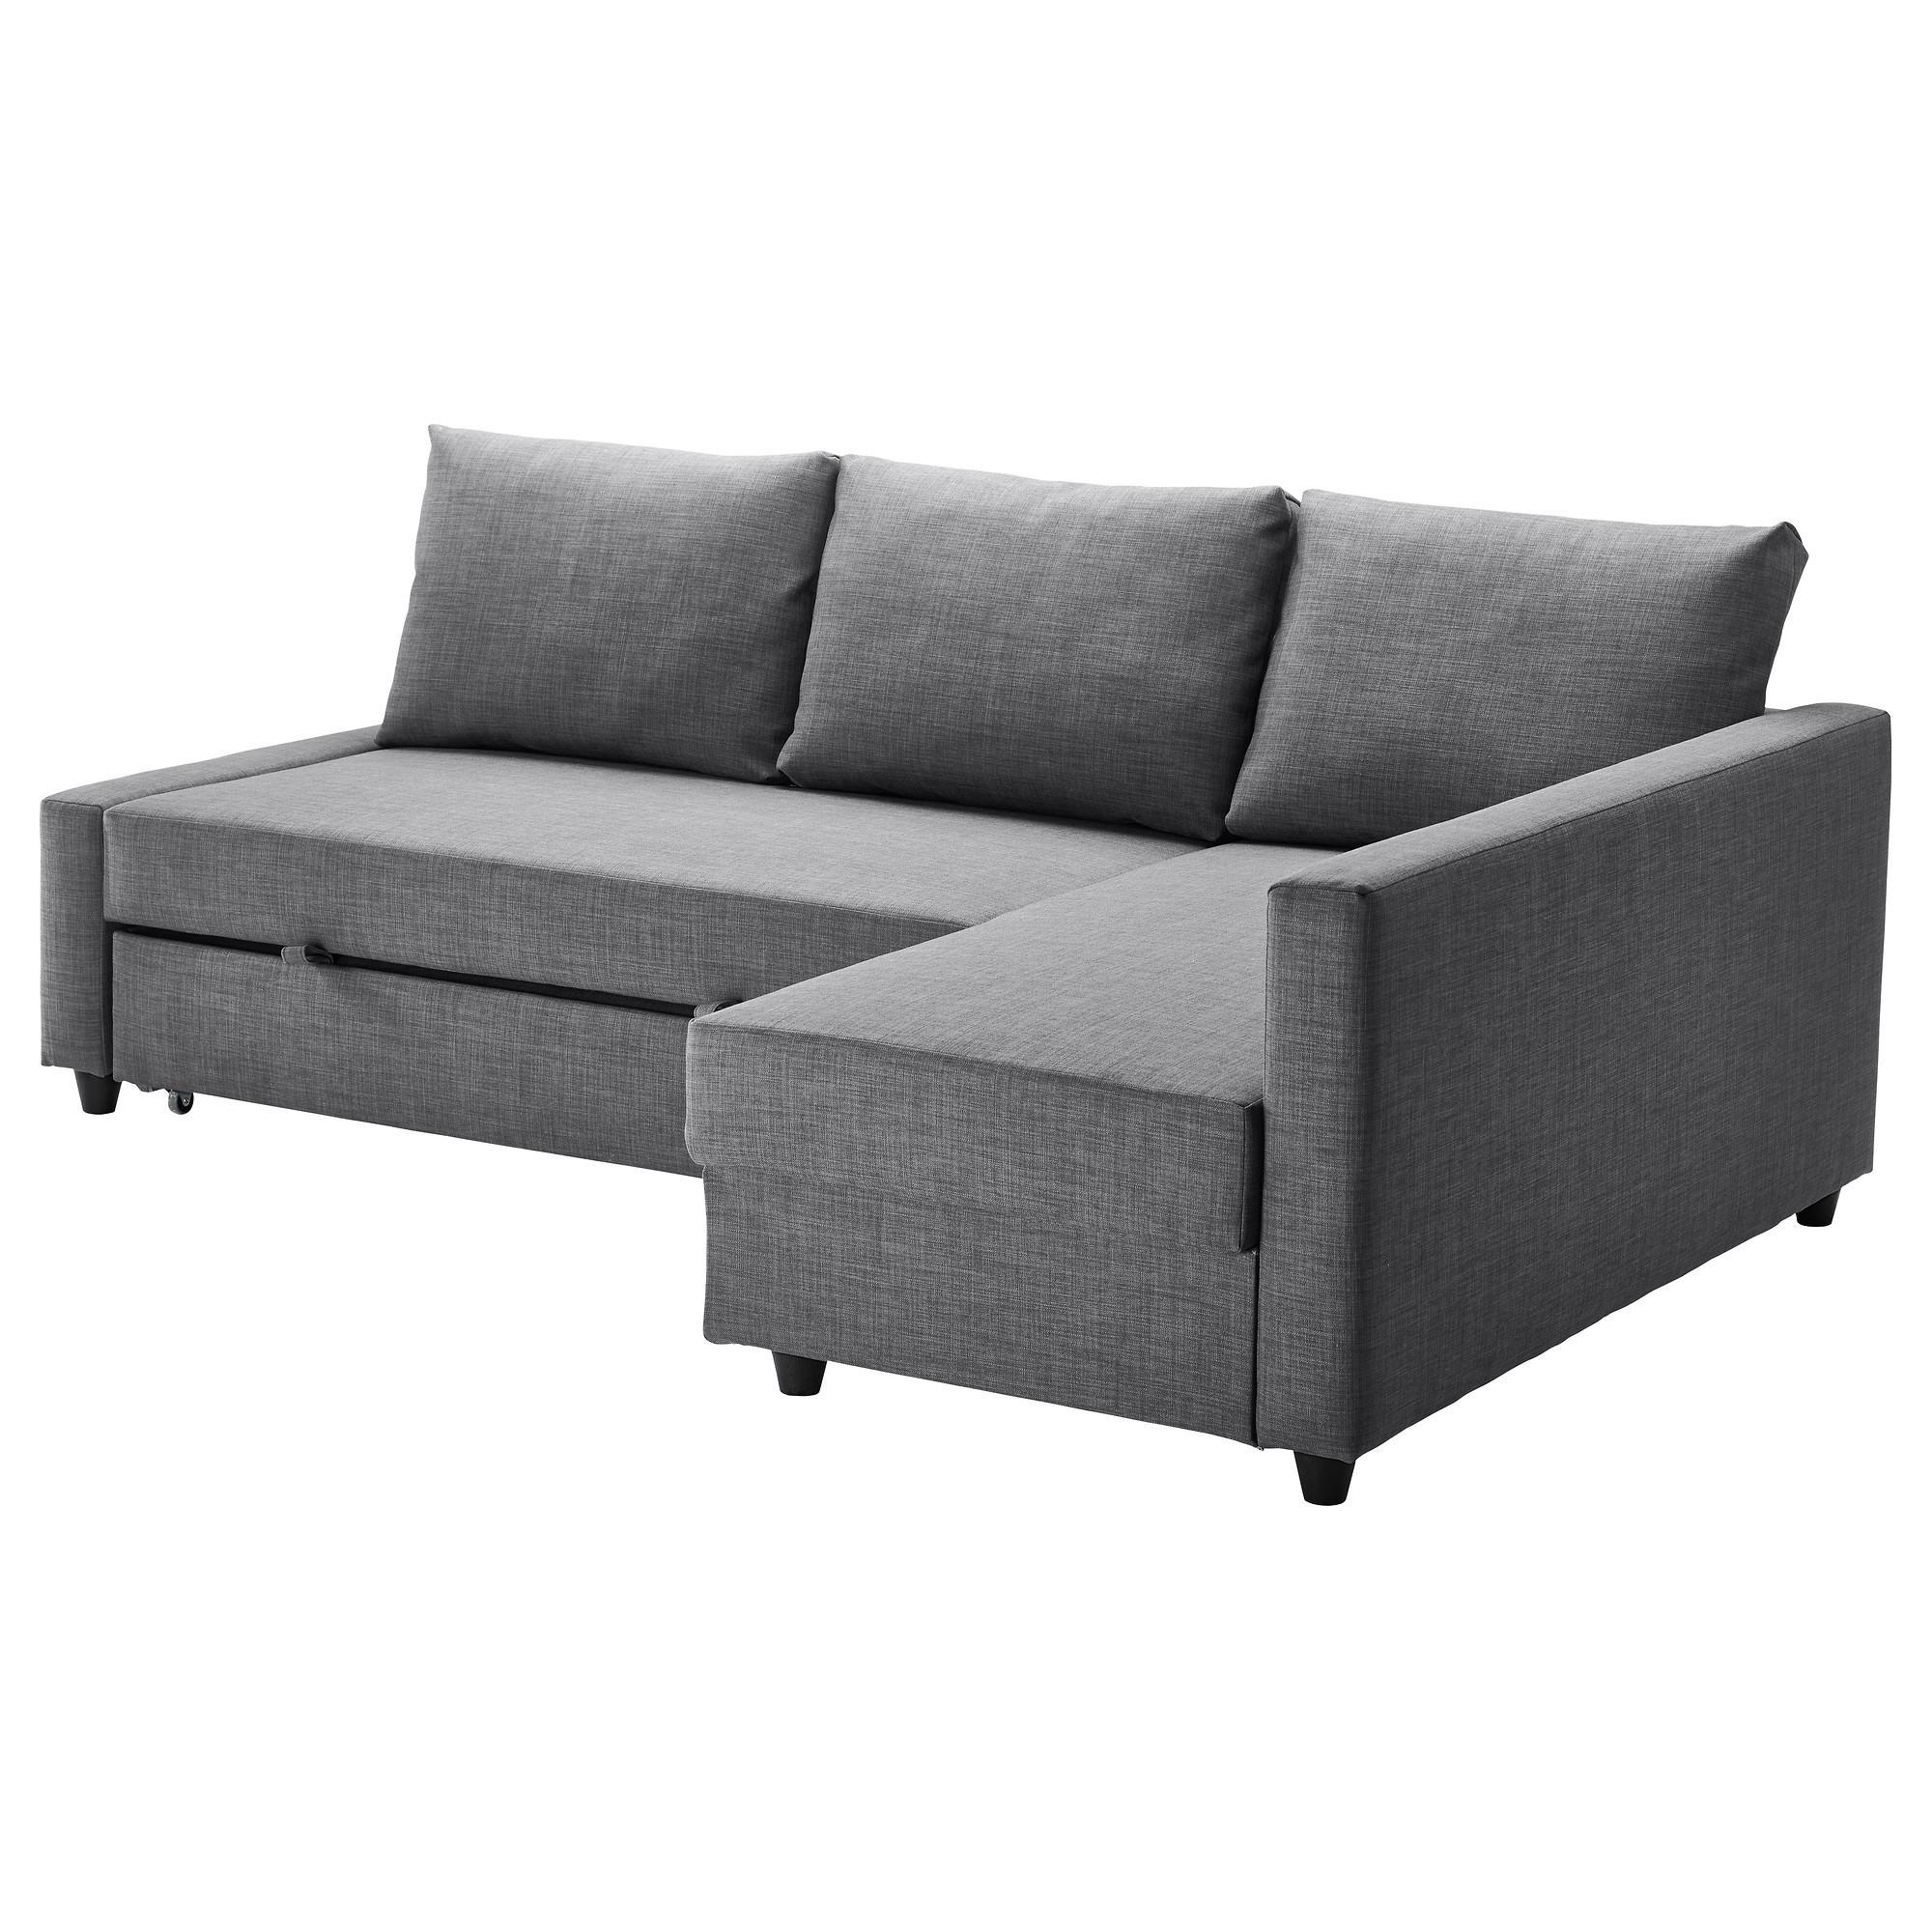 Sofa Beds & Futons – Ikea For Mini Sofa Sleepers (View 3 of 20)